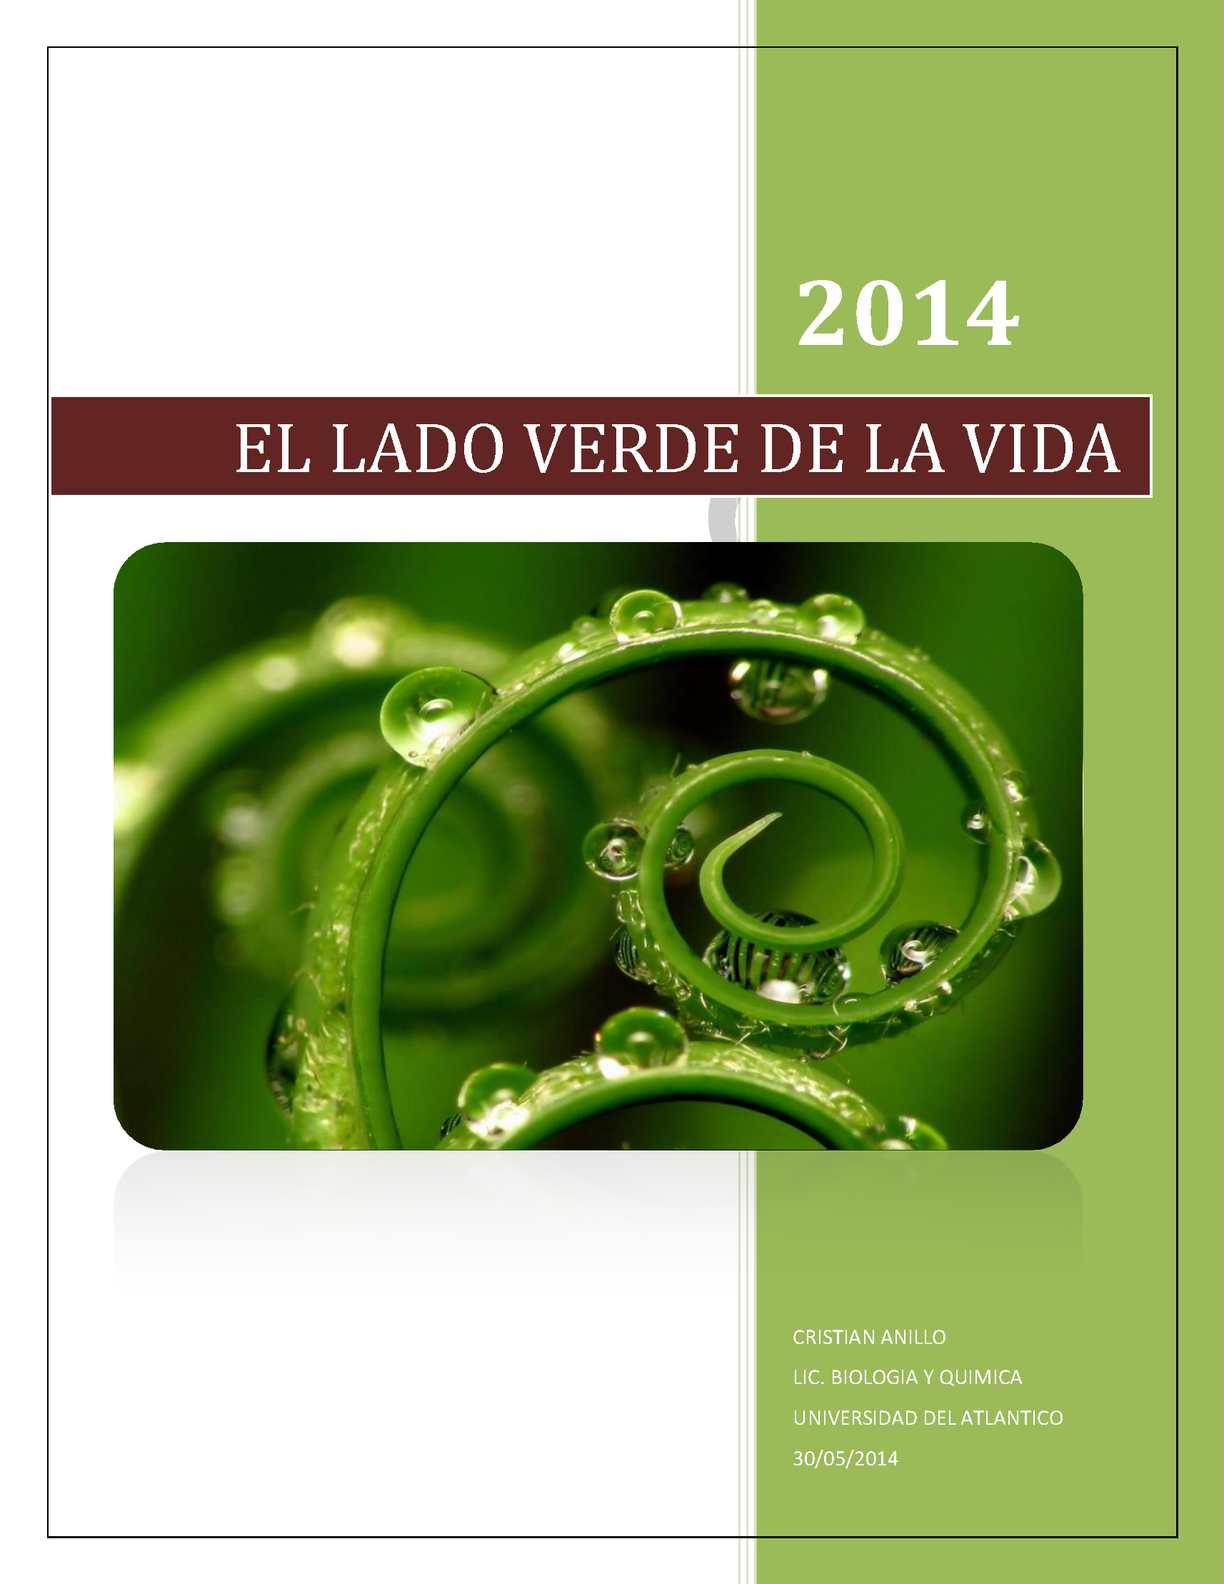 Calaméo - Morfo fisiologia vegetal cristian anillo